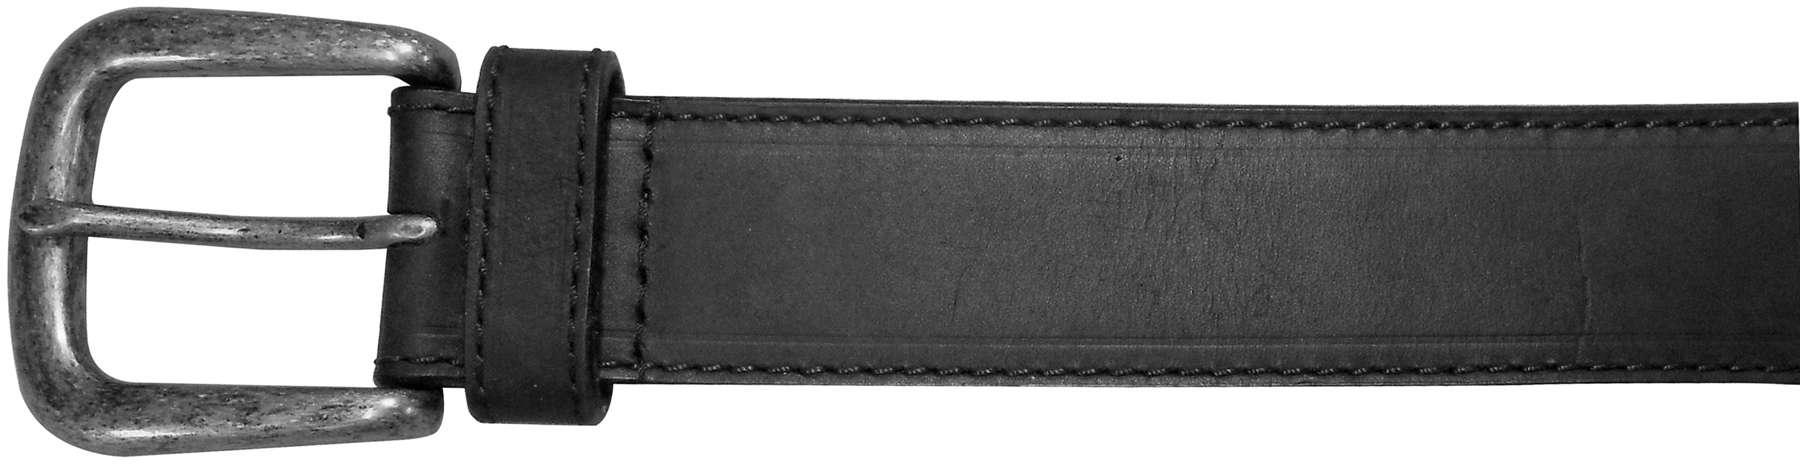 "10625410142 - 42"" Black Plain Field & Stream Leather Belt"